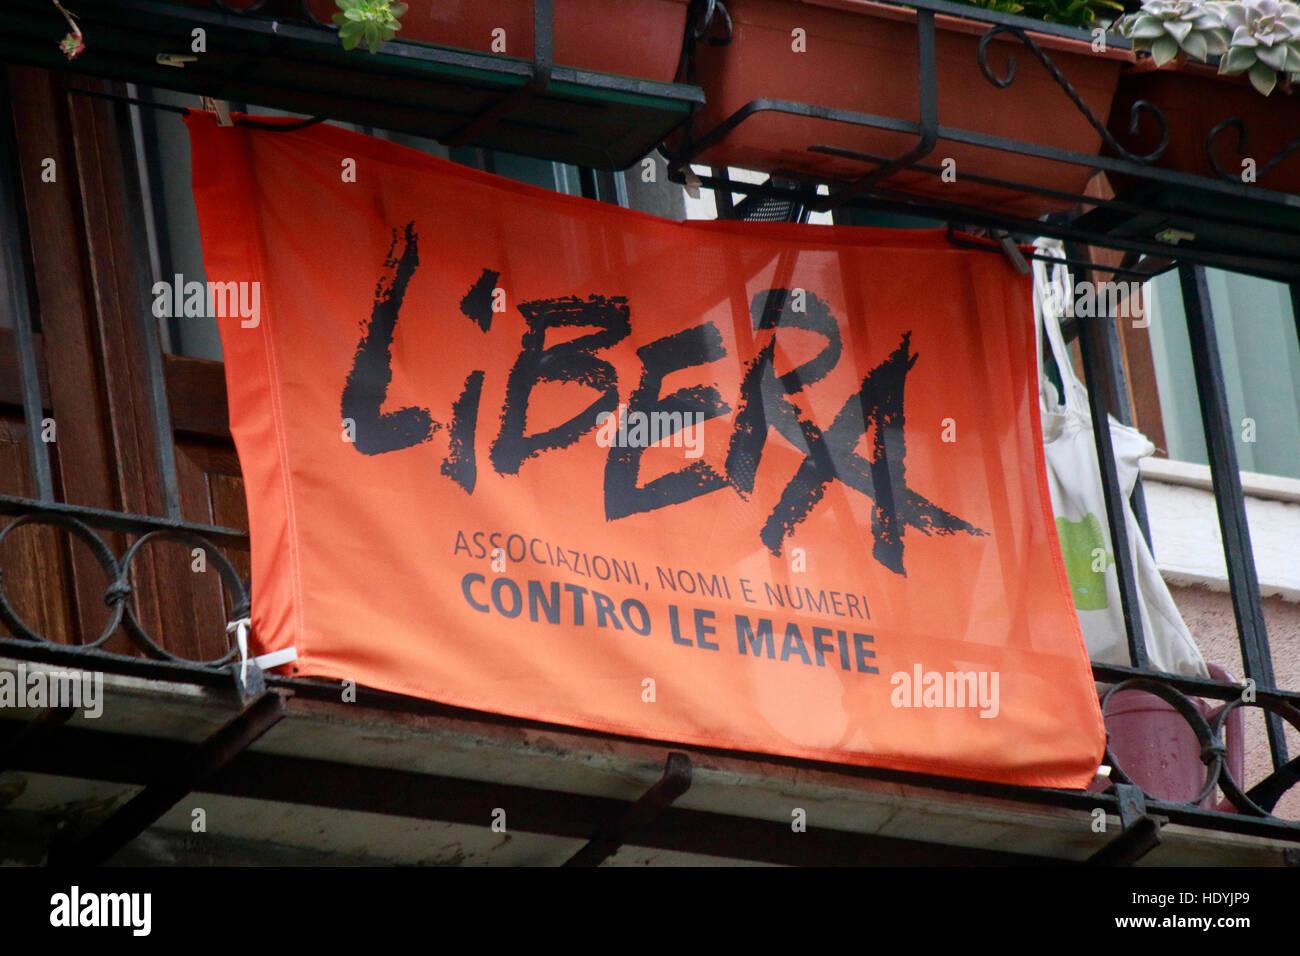 'Libera contre le mafie' - Protest gegen die Mafia, Venedig, Italien. - Stock Image